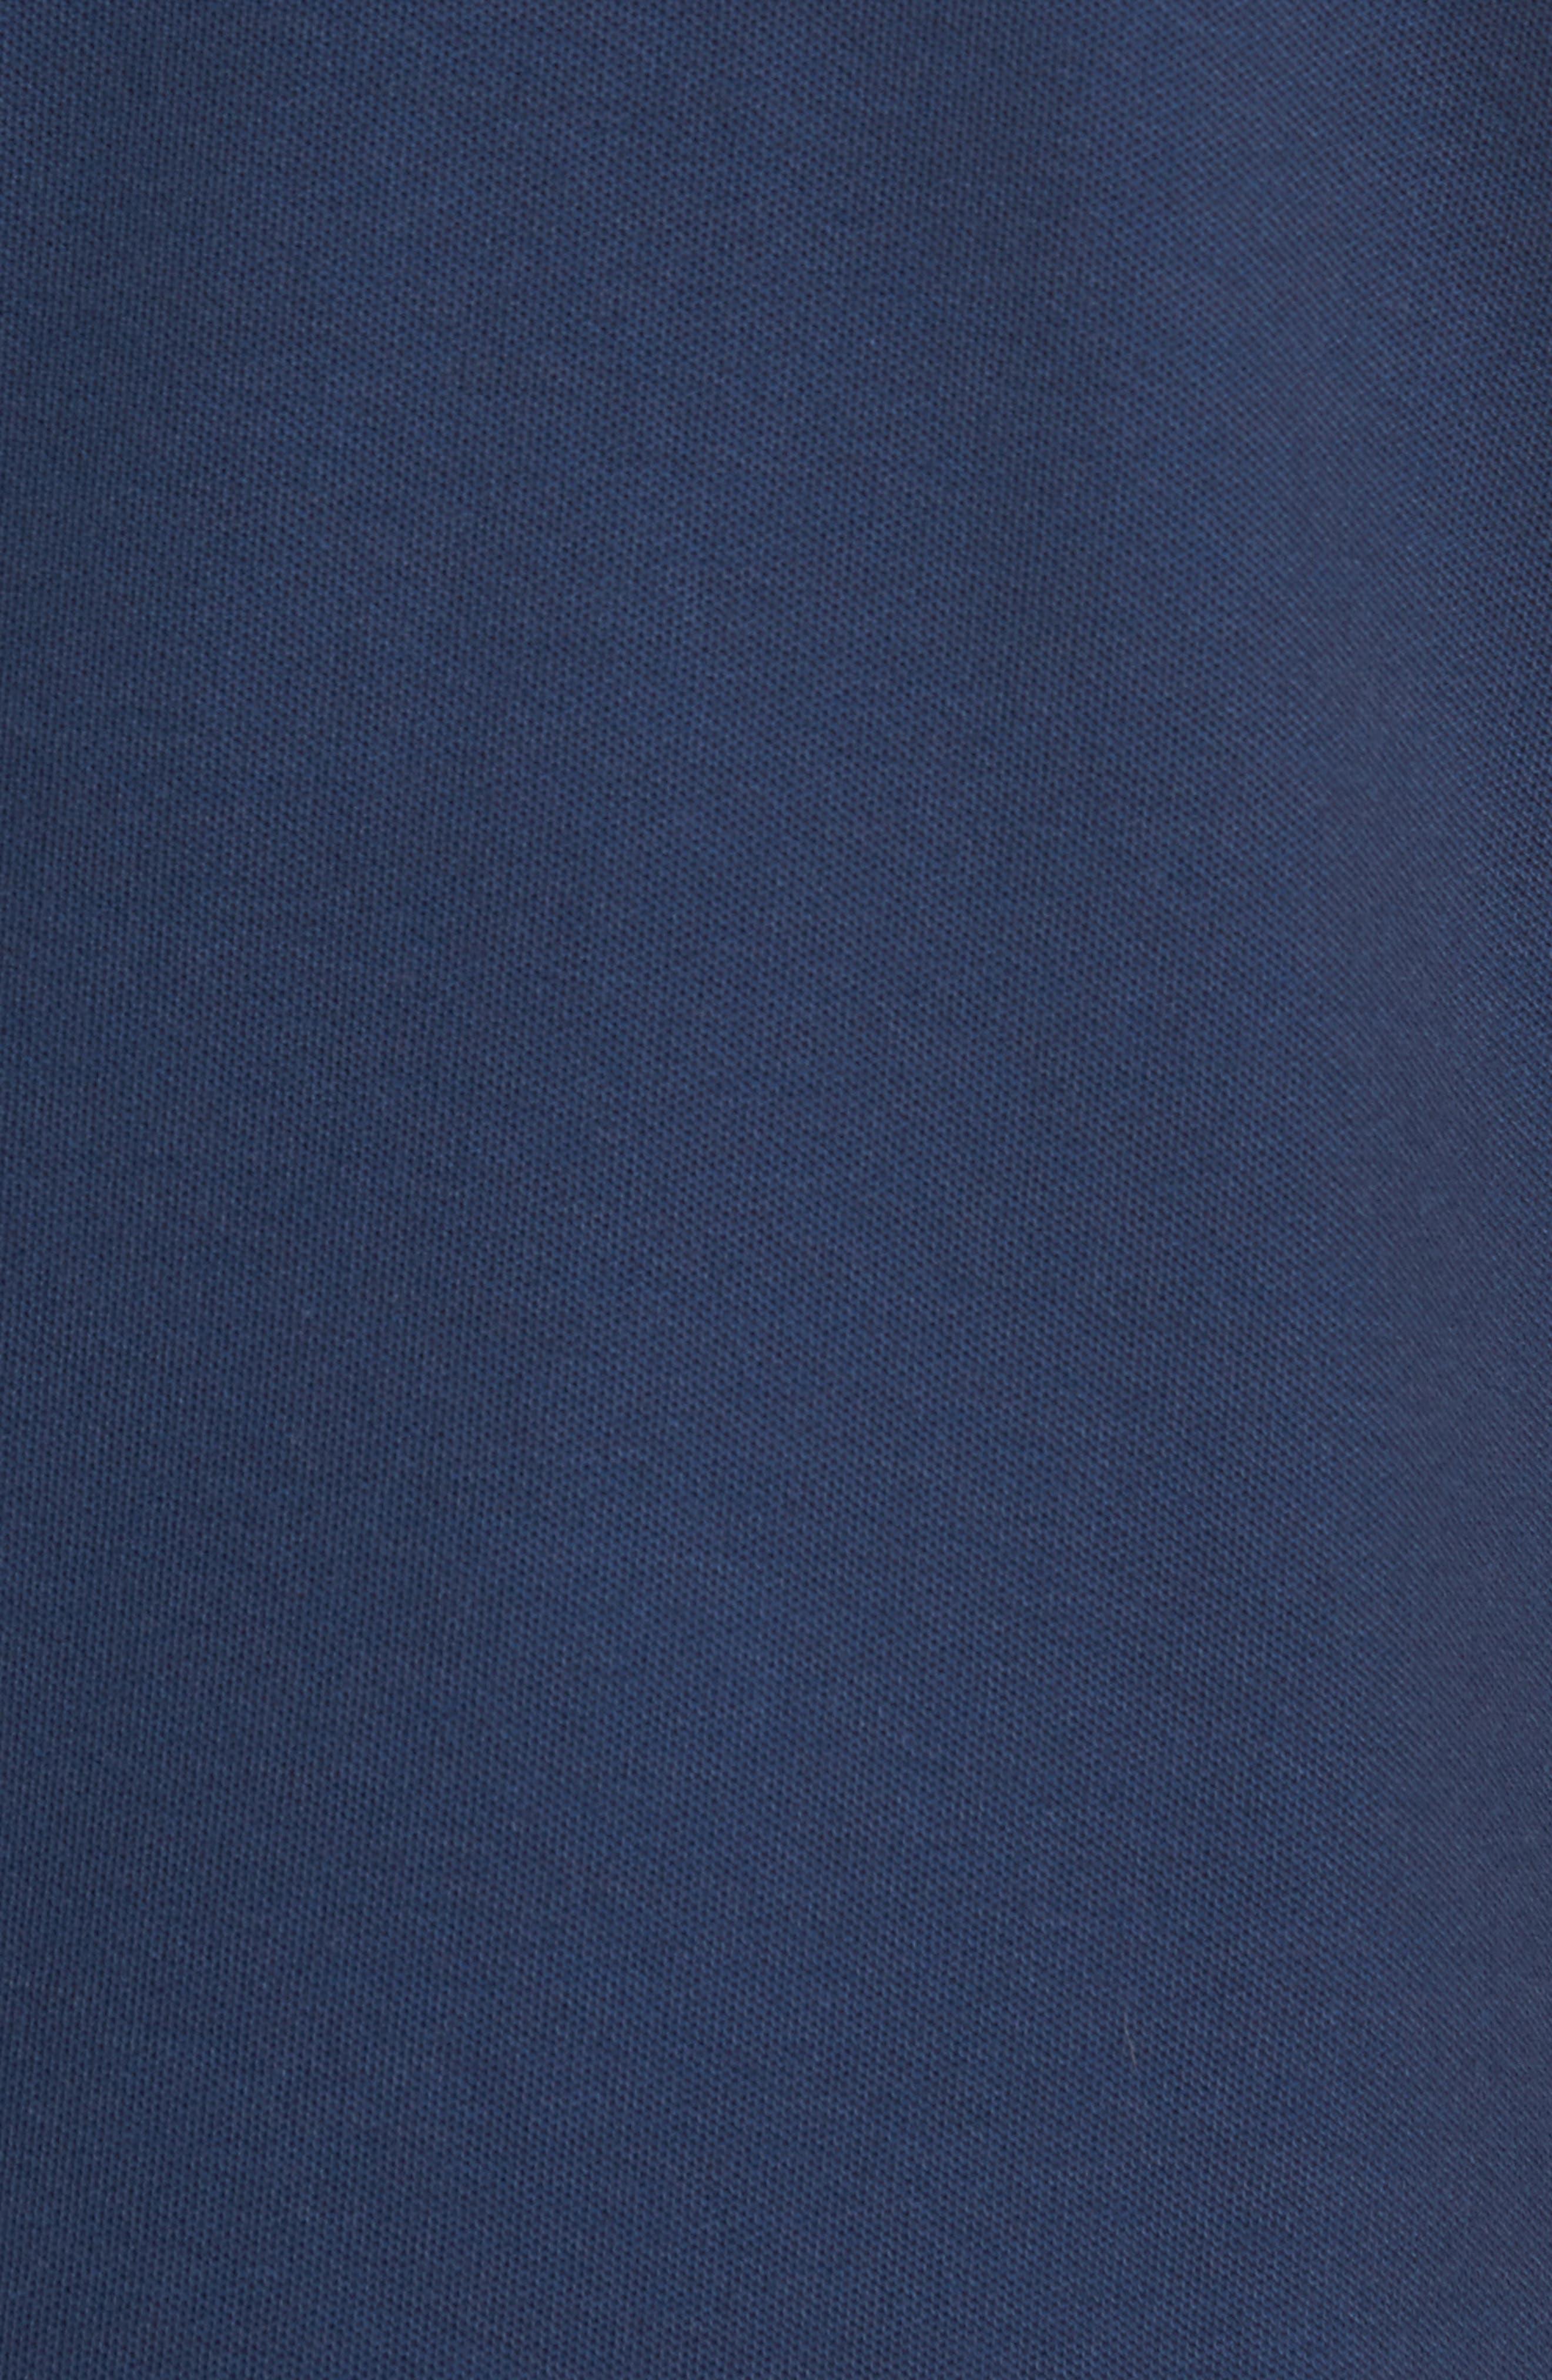 Reverse Oxford Quarter Zip Pullover,                             Alternate thumbnail 5, color,                             Vineyard Navy